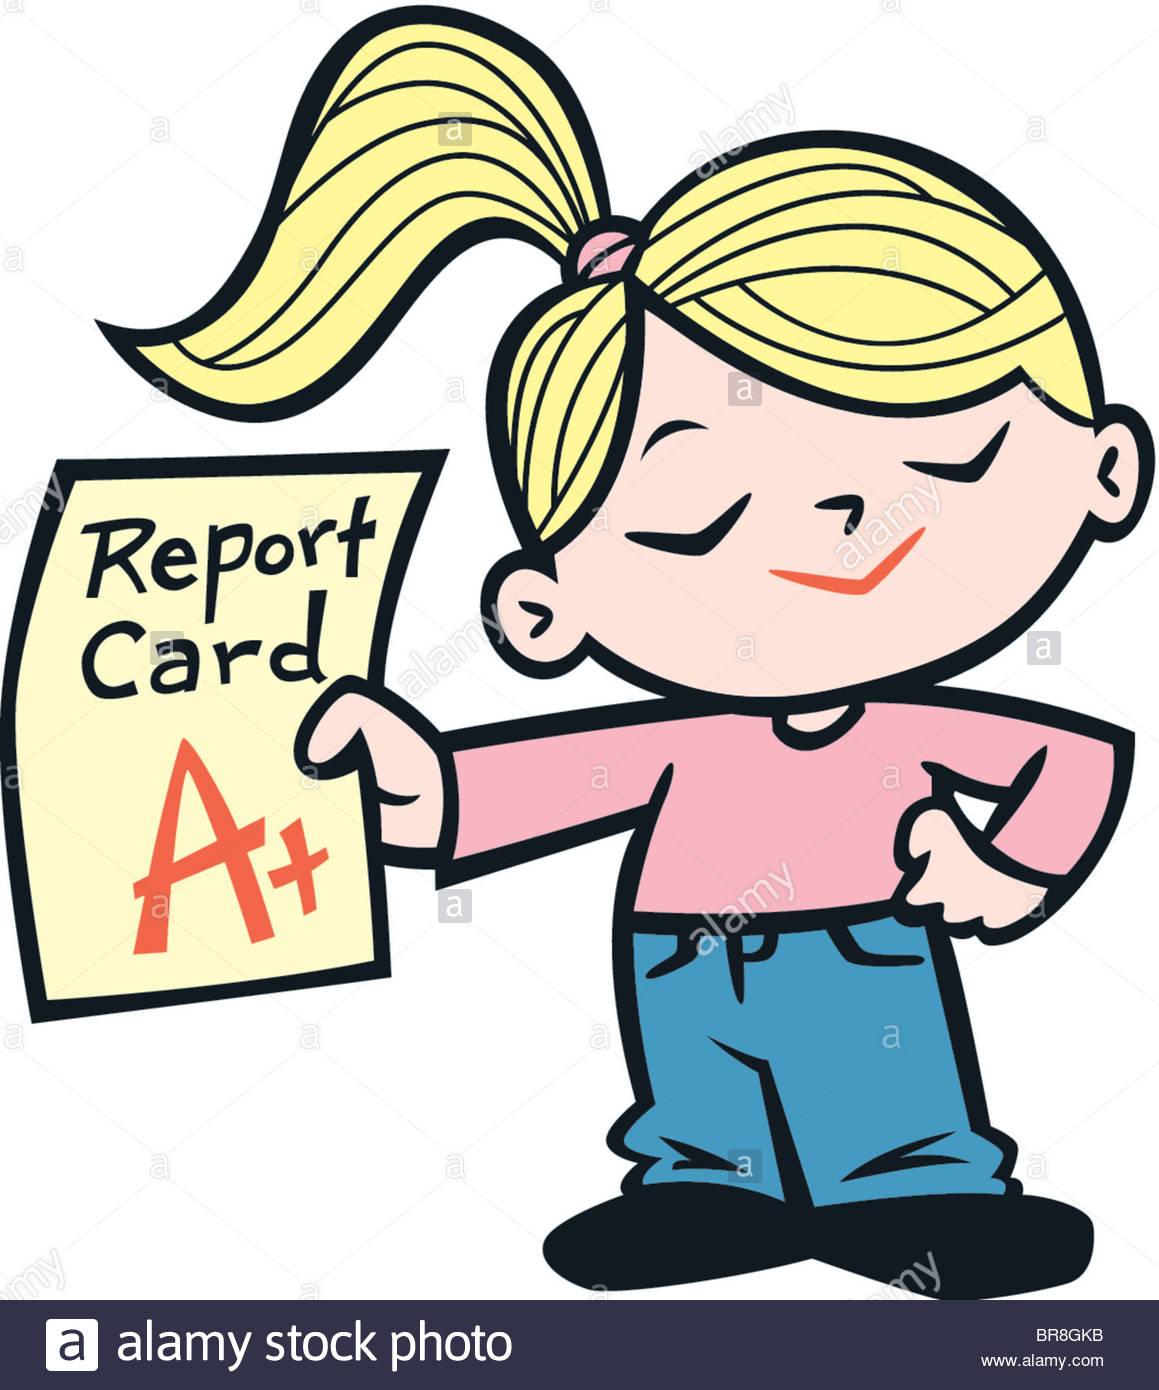 1159x1390 Report Card School Stock Photos Amp Report Card School Stock Images